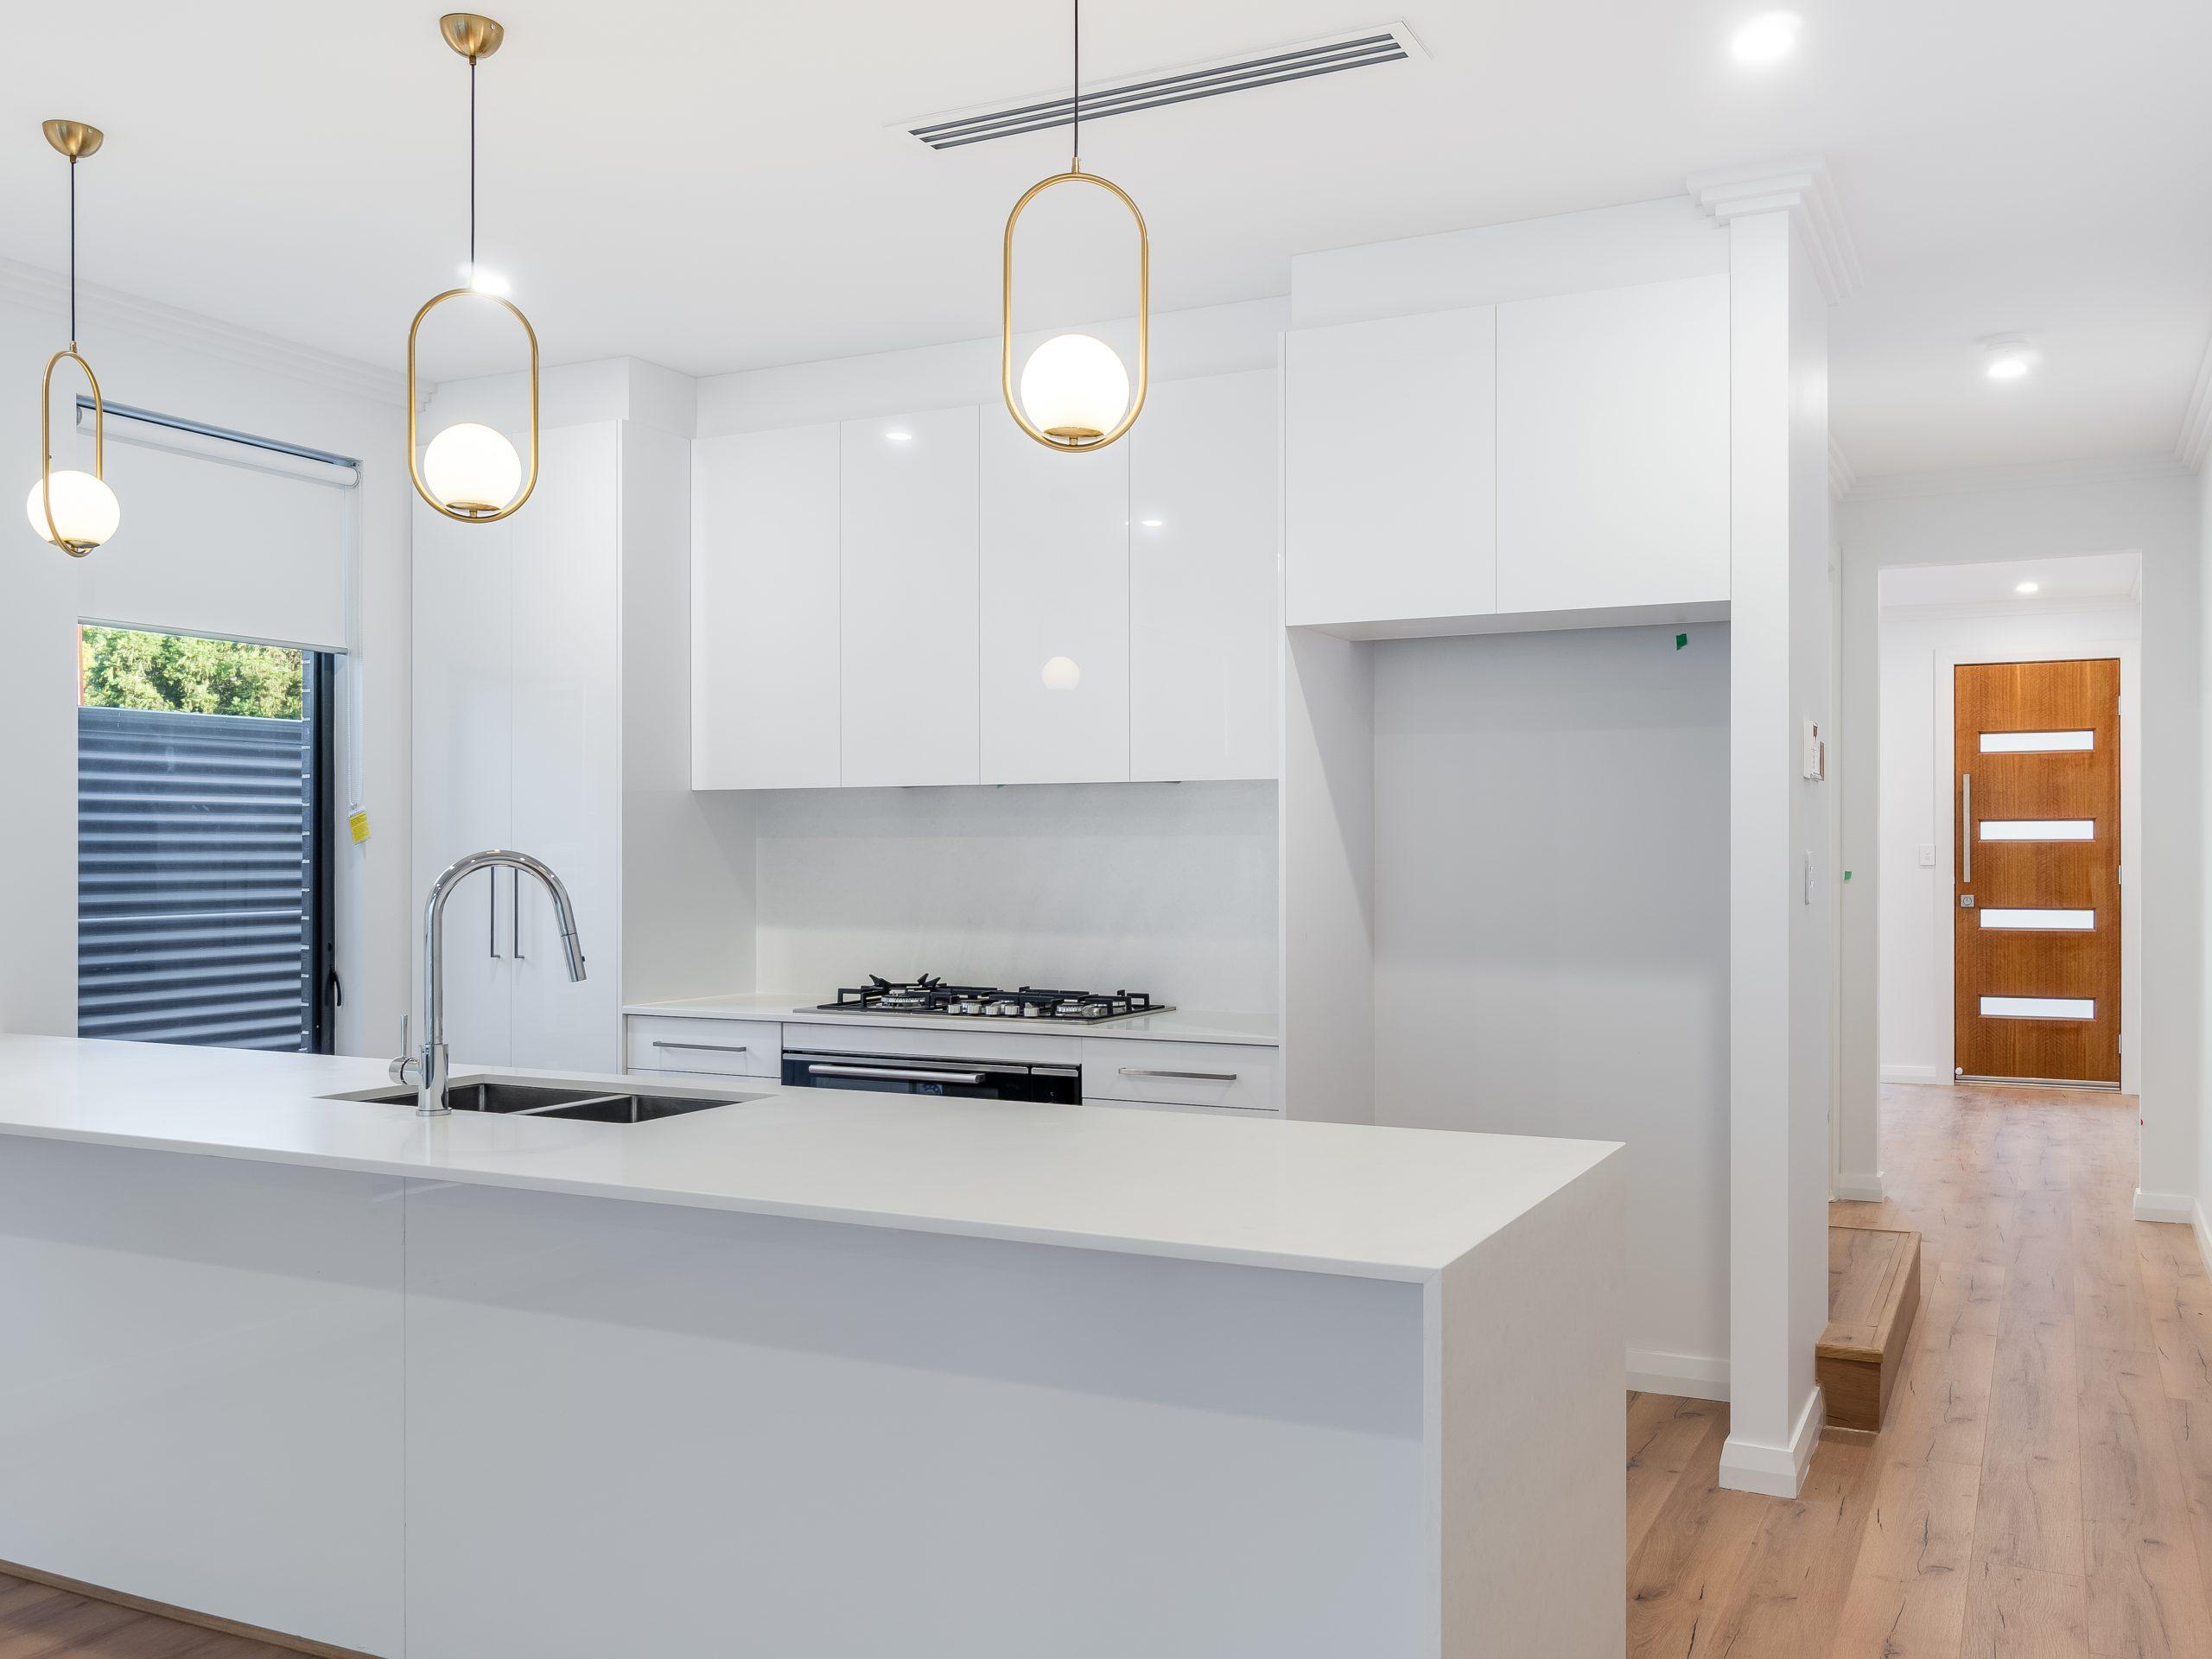 Tranmere - Richardson - HBC Homes Adelaide - _DSC2746